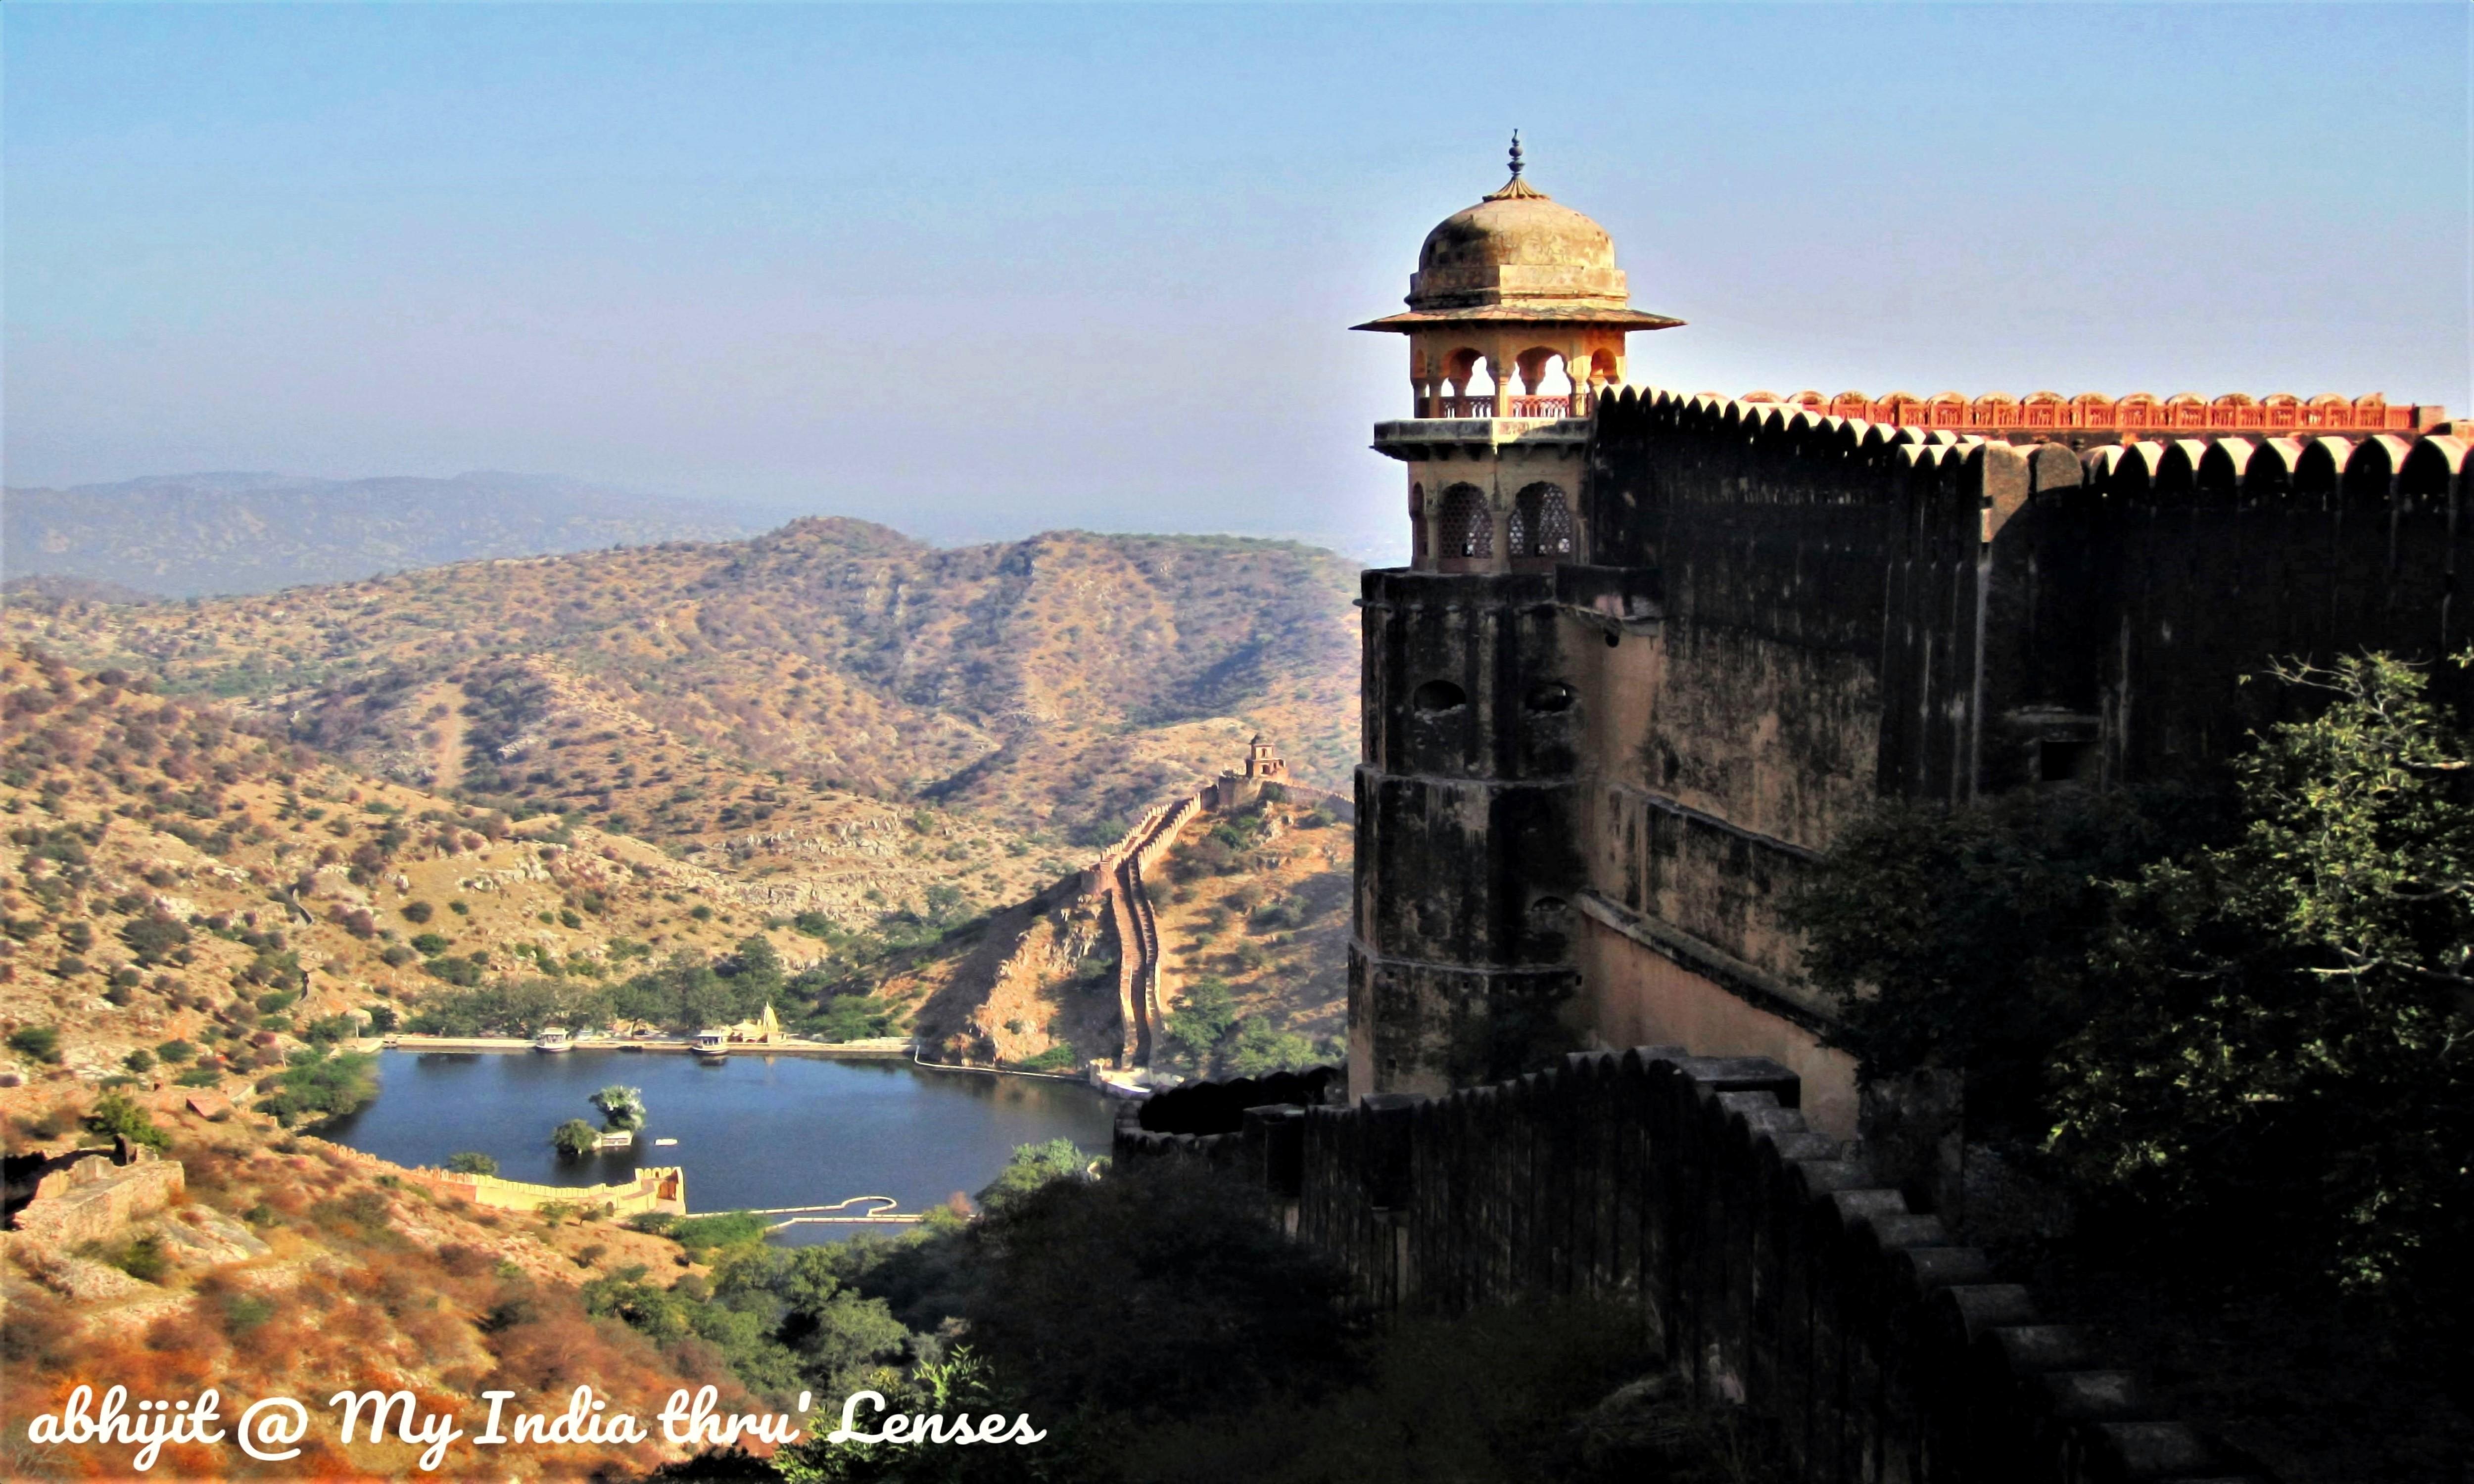 The Jaigarh Fort